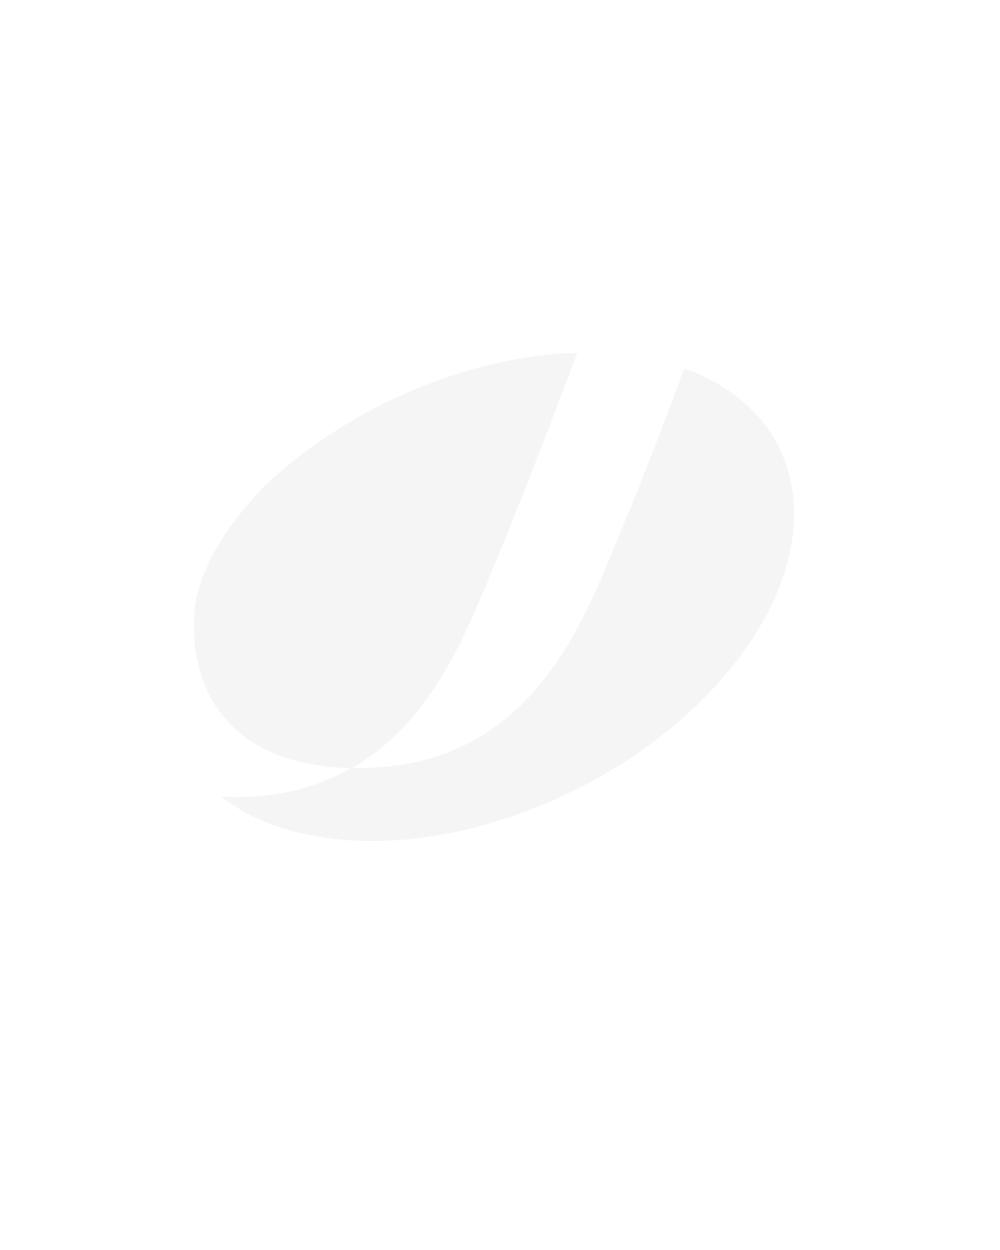 Stripe Crop Tee - GLYDER APPAREL